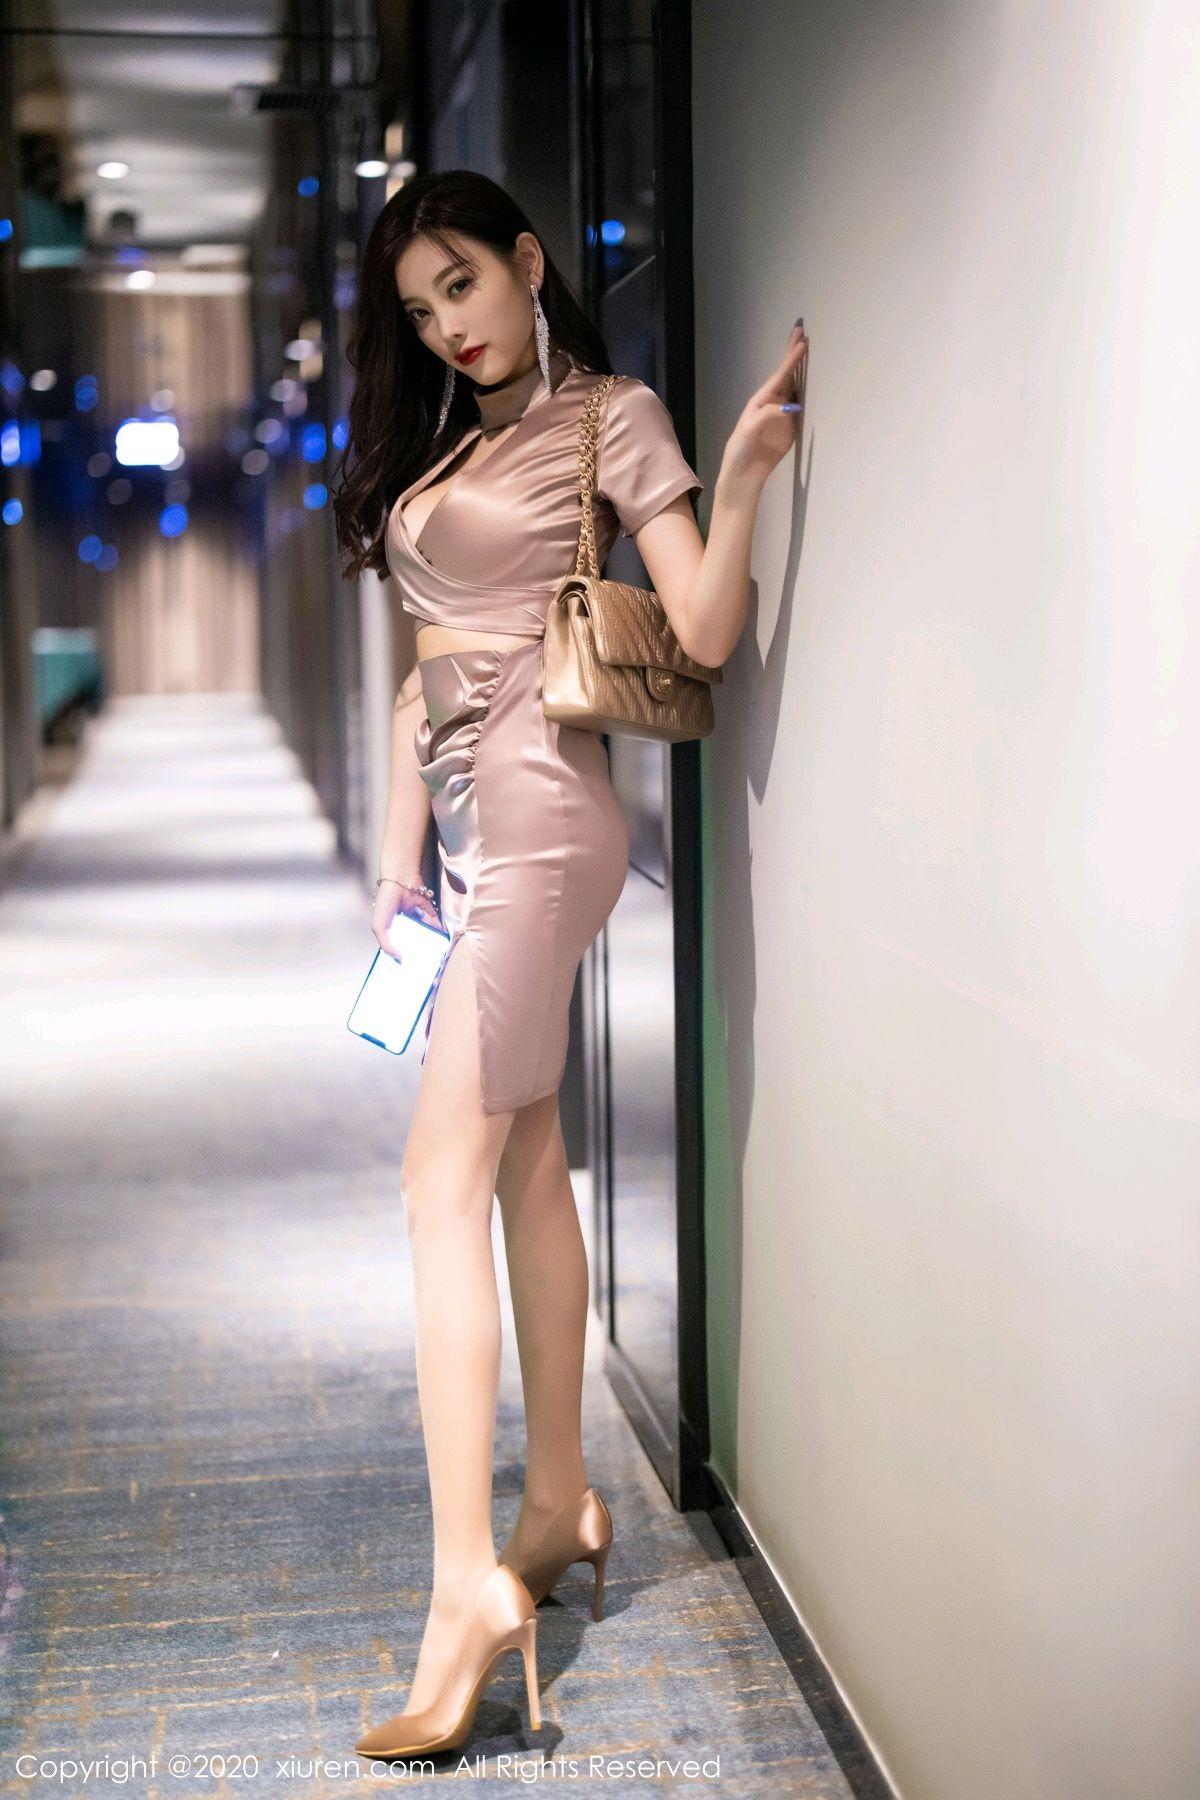 [XiuRen] Vol.2587 Yang Chen Chen 18P, Underwear, Xiuren, Yang Chen Chen